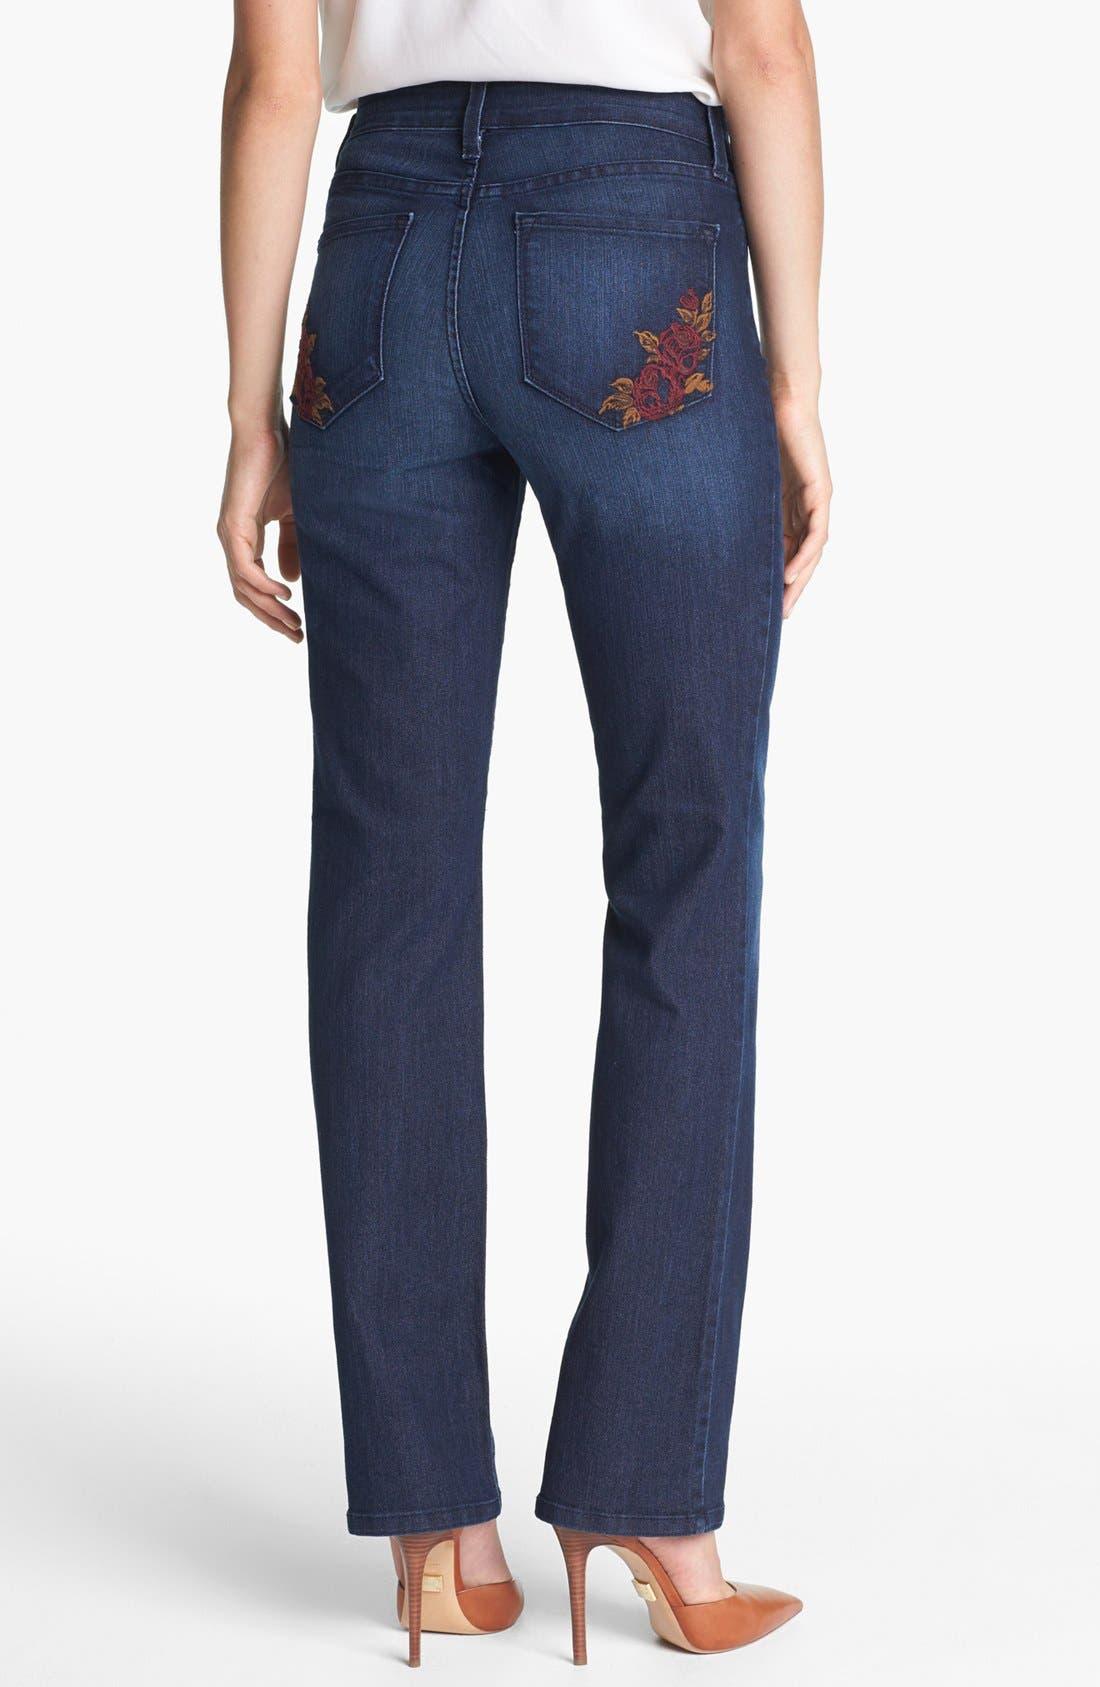 Alternate Image 3  - NYDJ 'Marilyn' Stretch Straight Leg Jeans (Dana Point) (Petite)